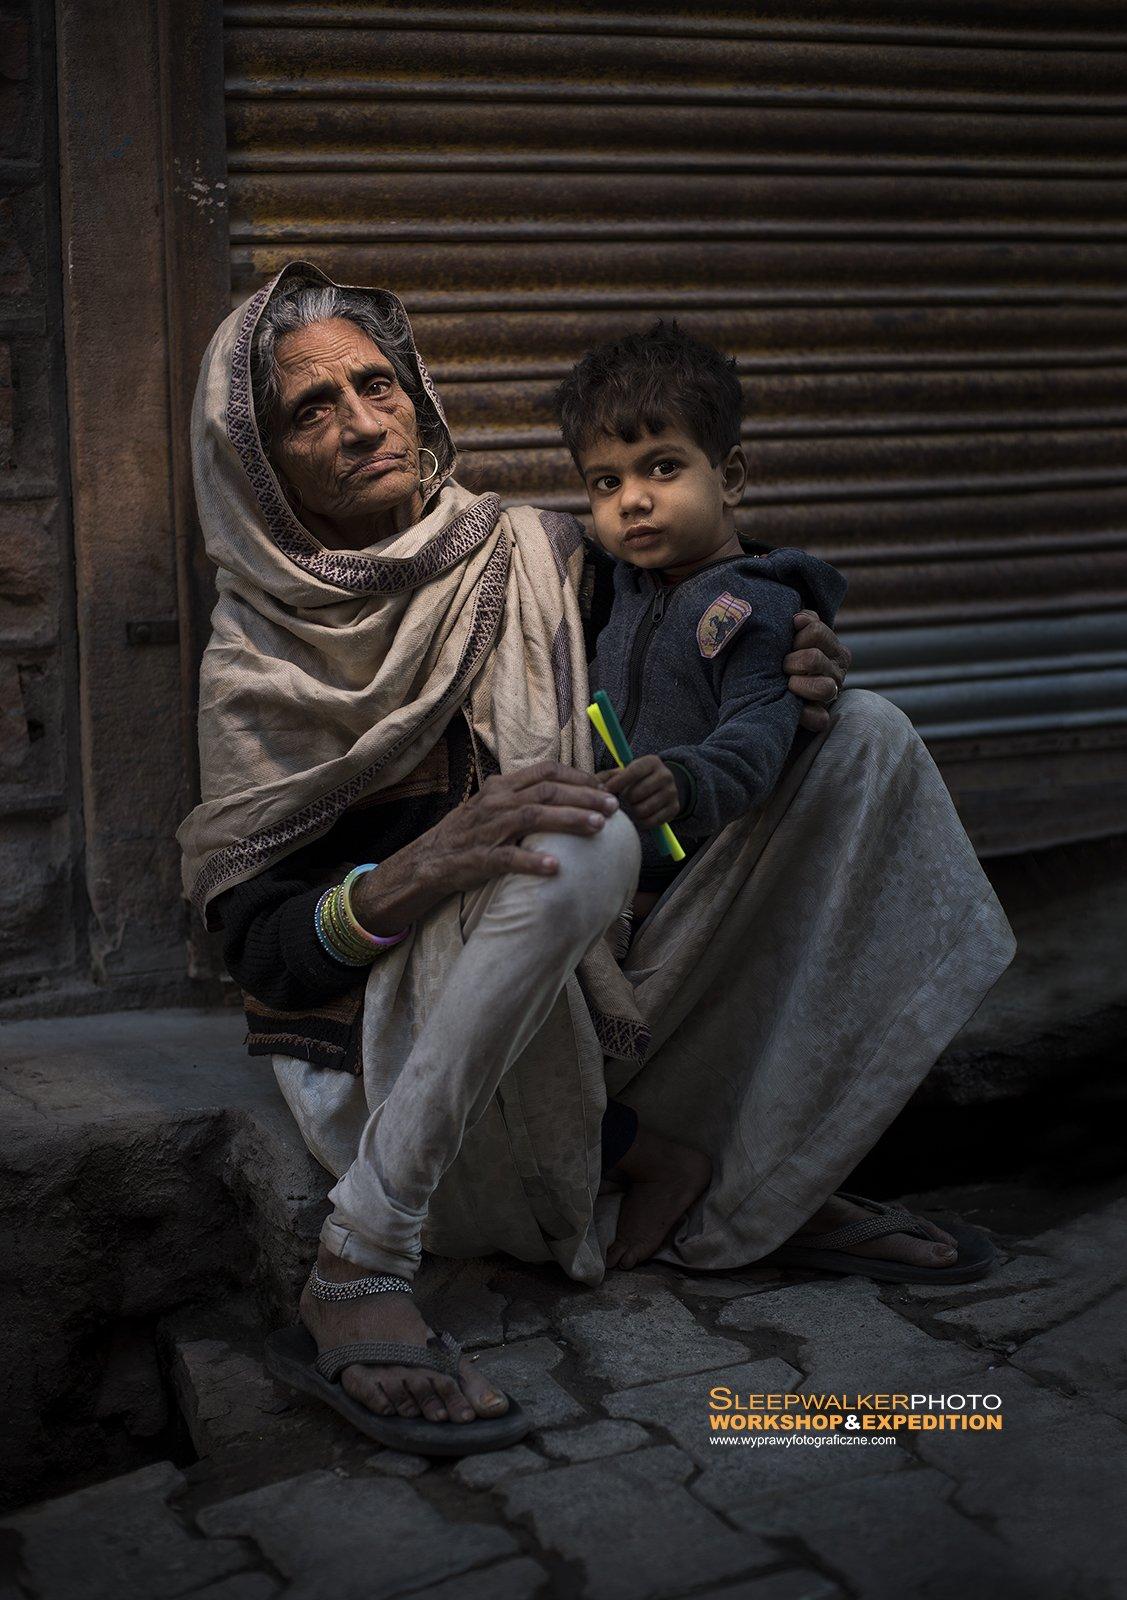 woman, people, children, portrait, india, Tomek Jungowski